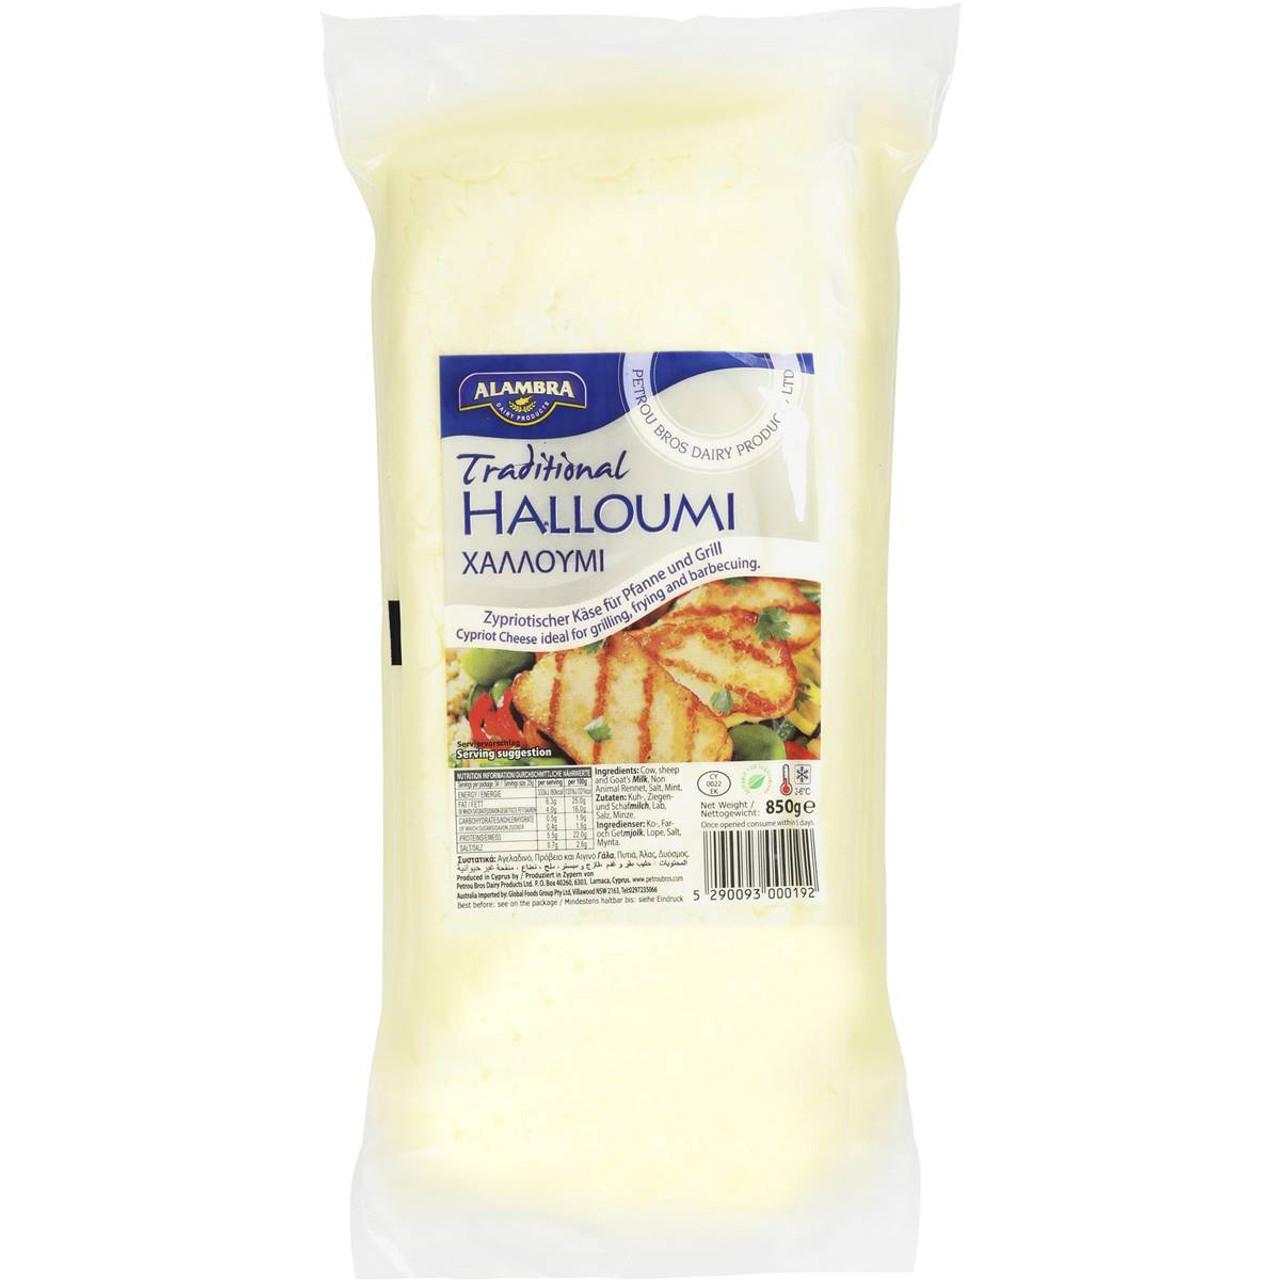 Cyprus Haloumi Cheese 850G - Alambra